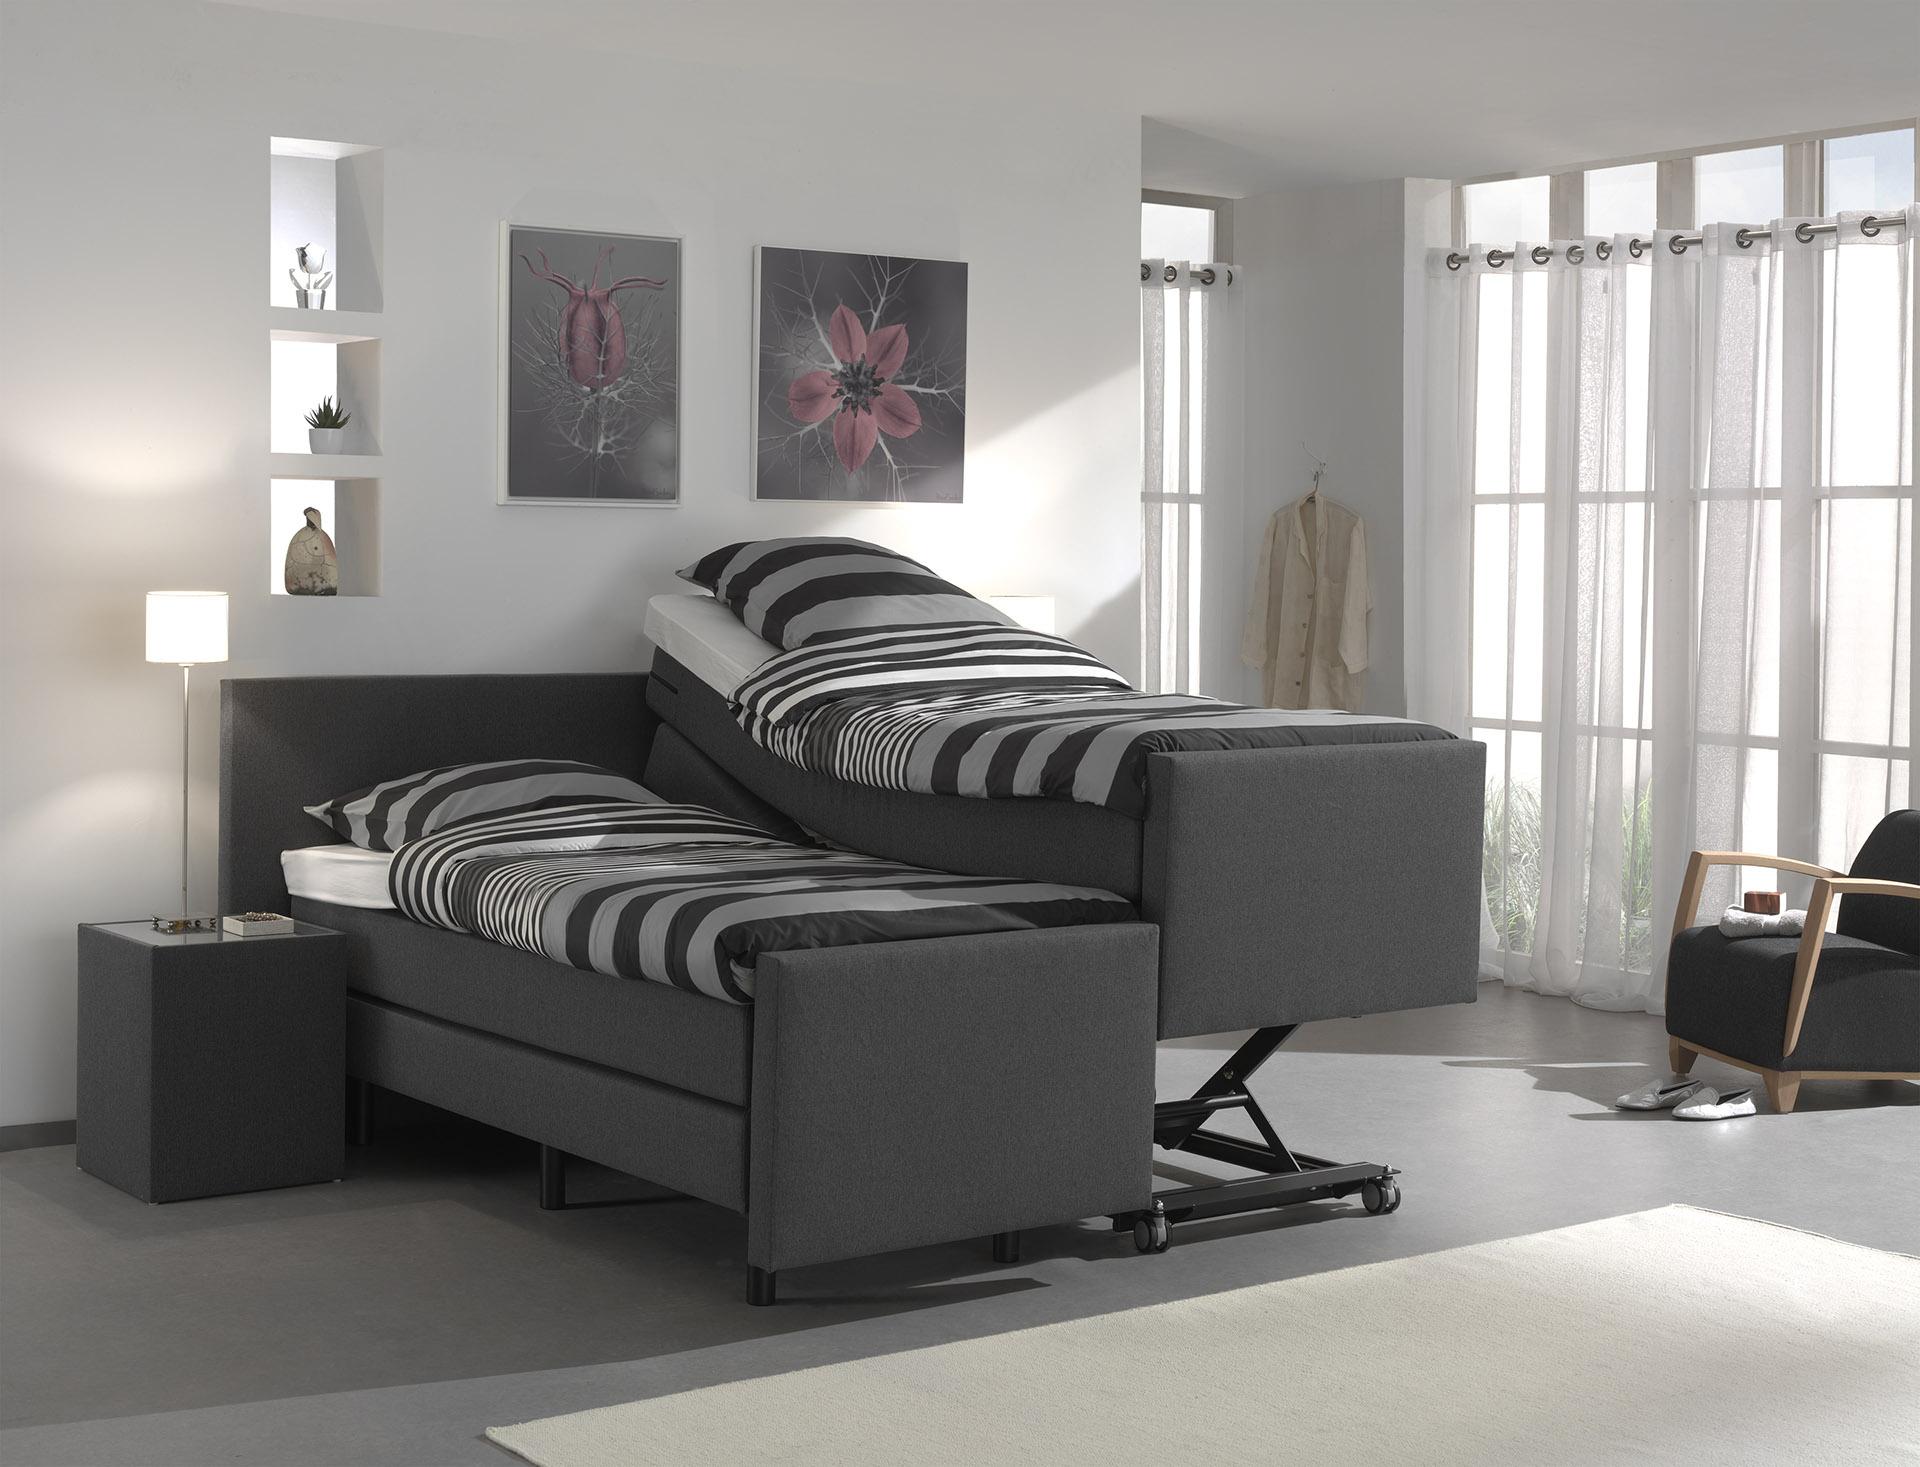 hoog laag boxspring cura de slaapfabriek. Black Bedroom Furniture Sets. Home Design Ideas